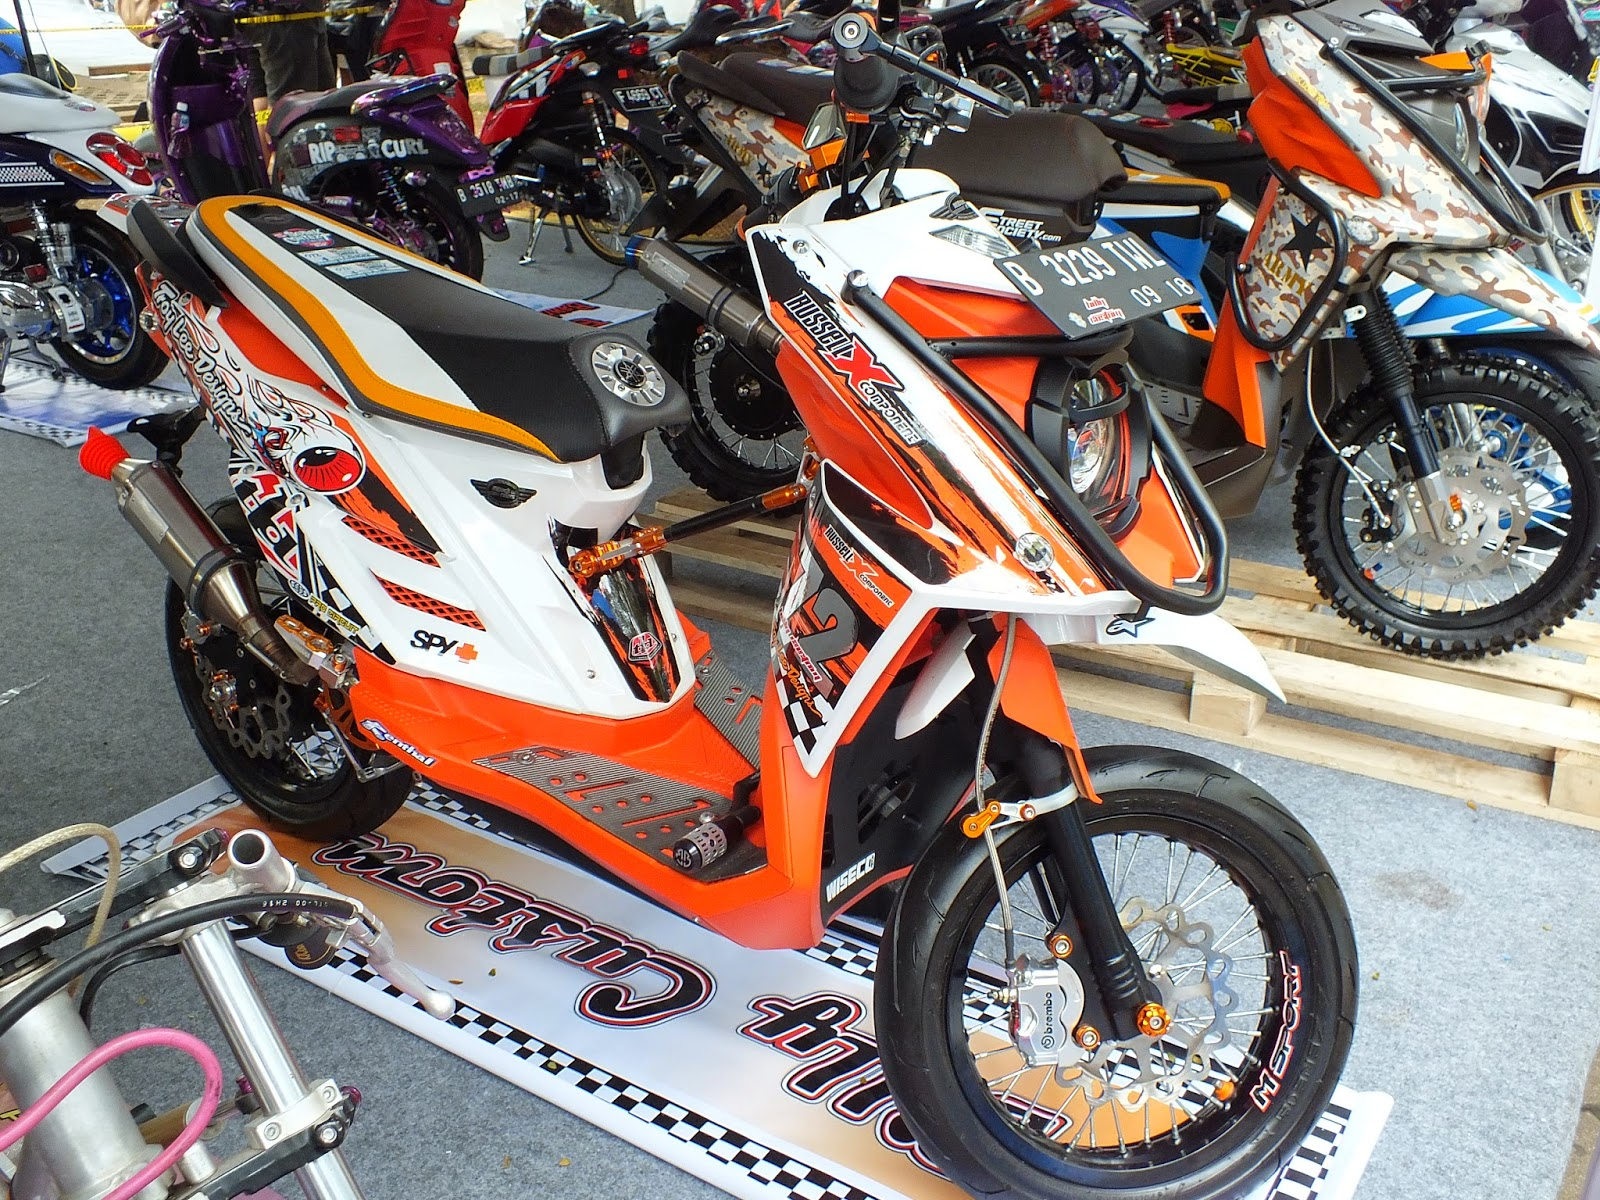 99 Modifikasi Motor Trail Yamaha X Ride Terbaru Dan Terlengkap